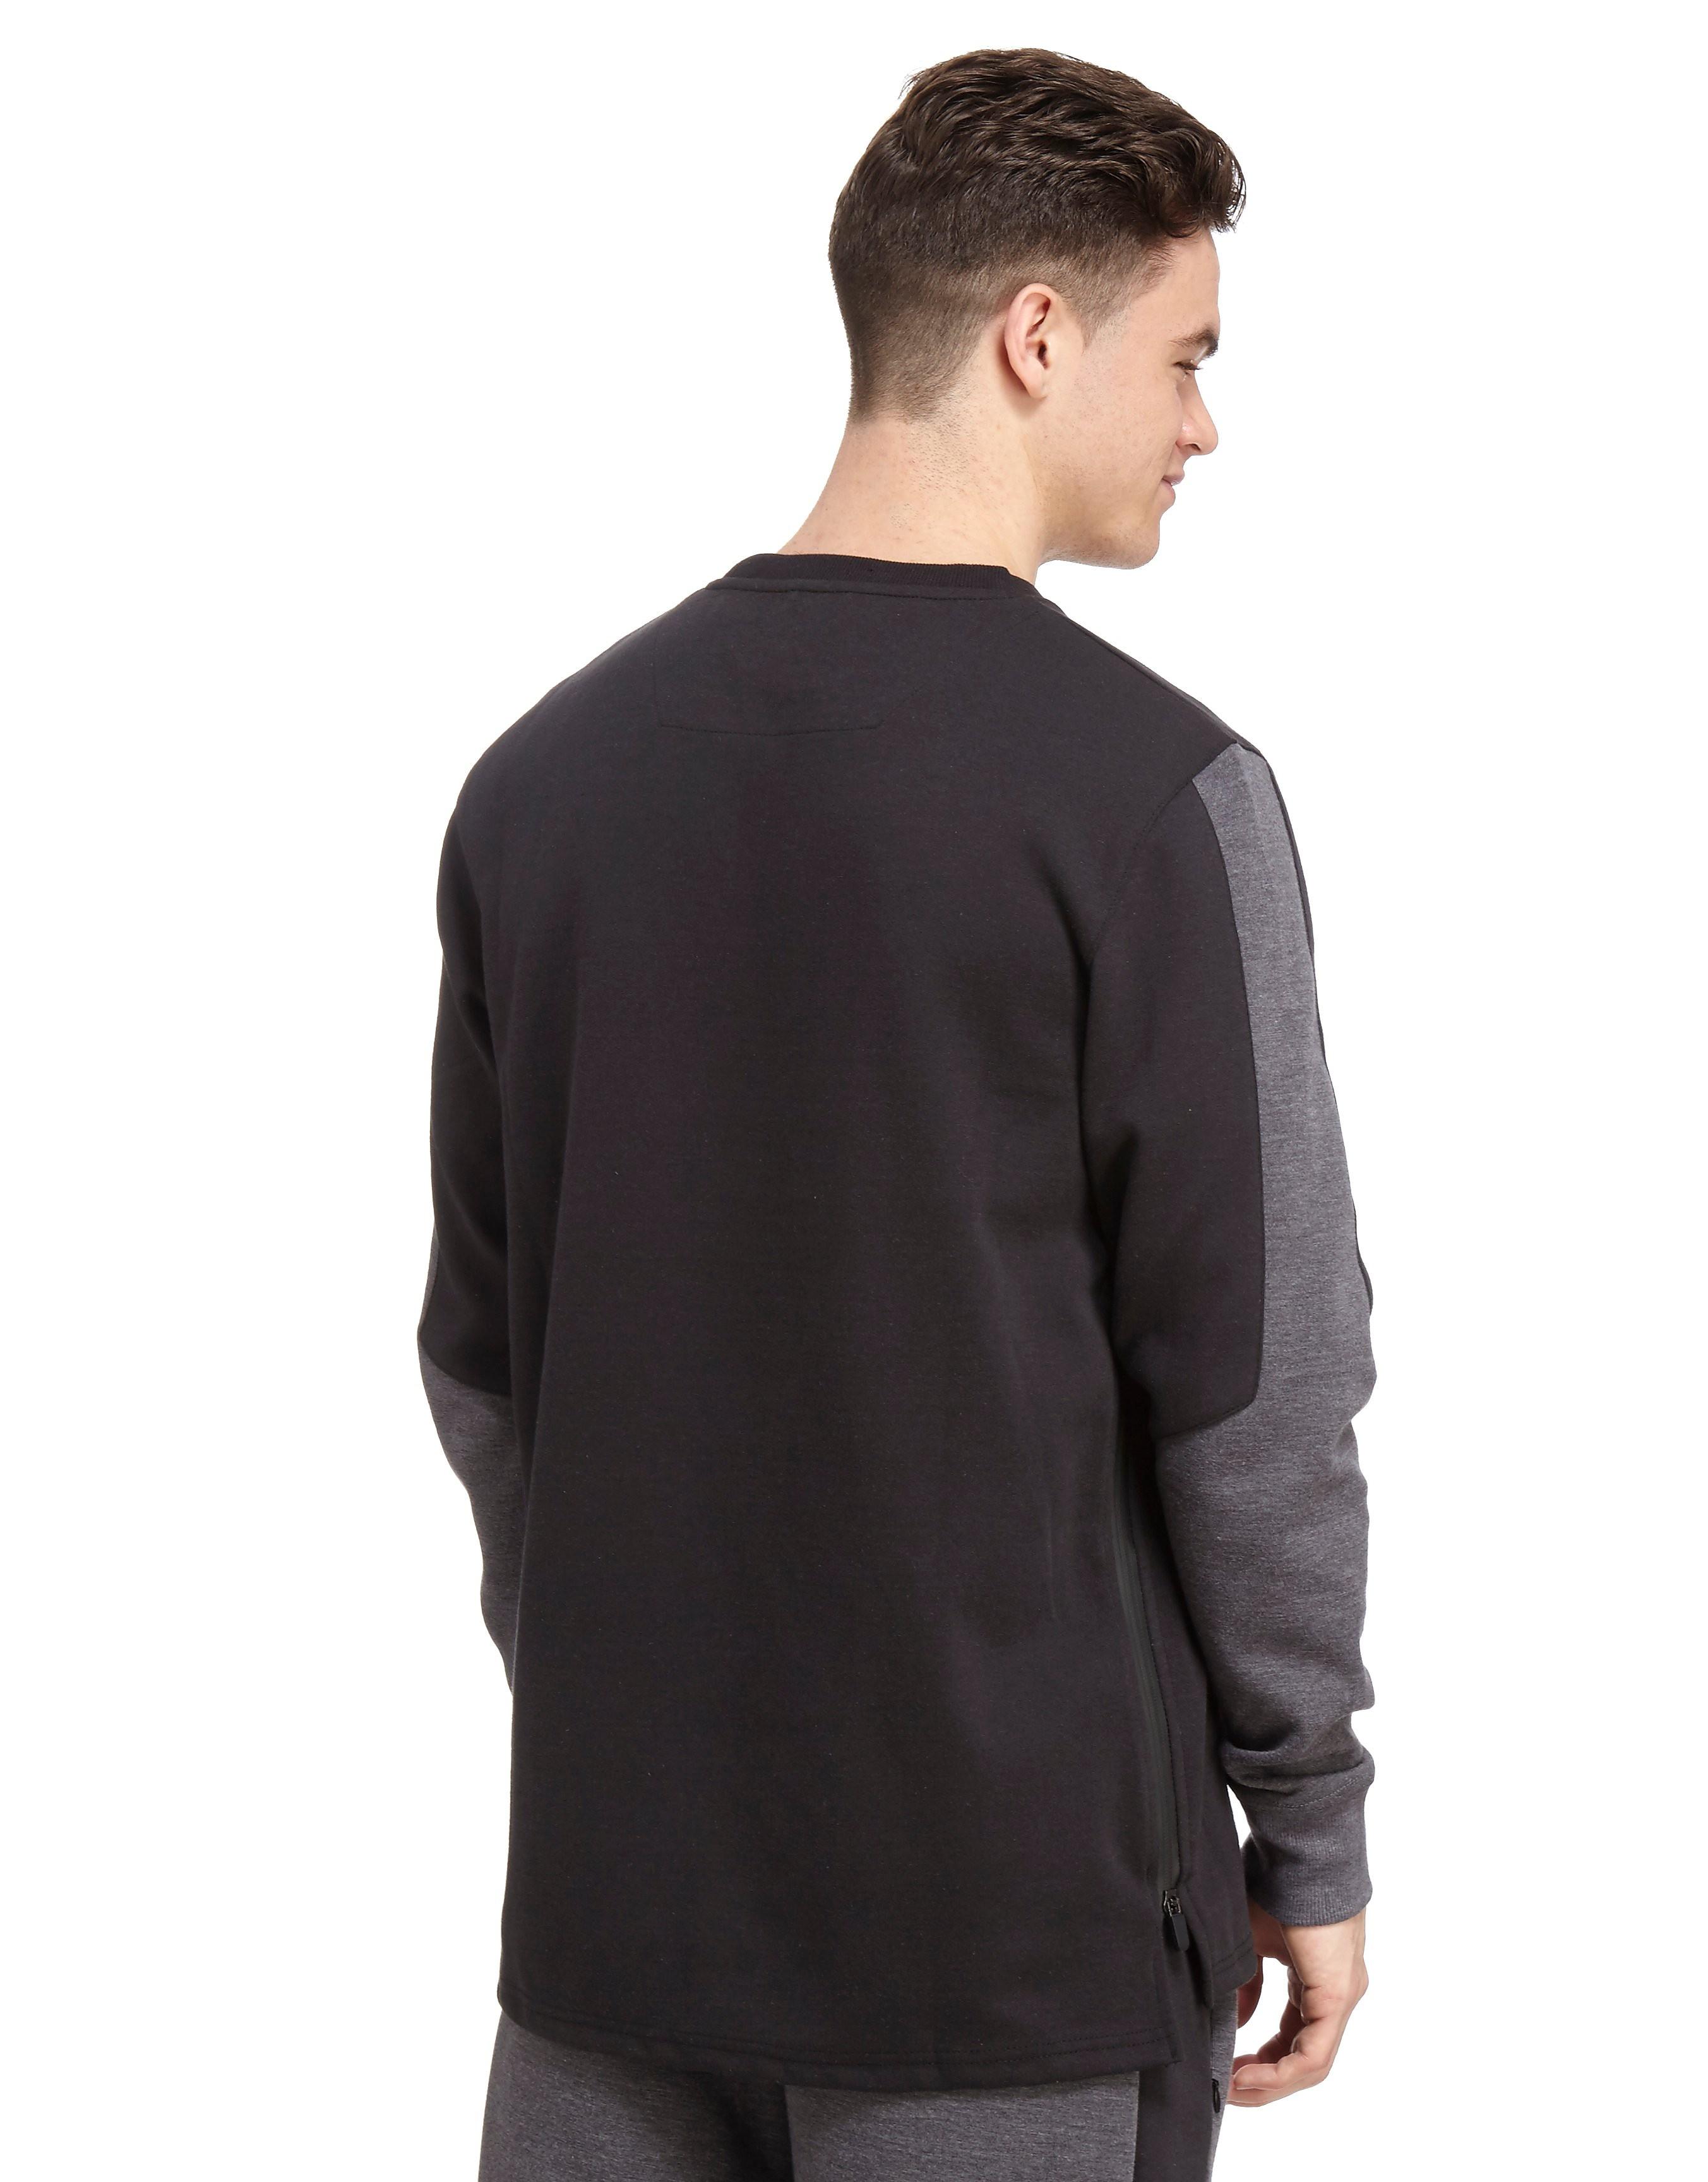 Duffer of St George System Crew Sweatshirt